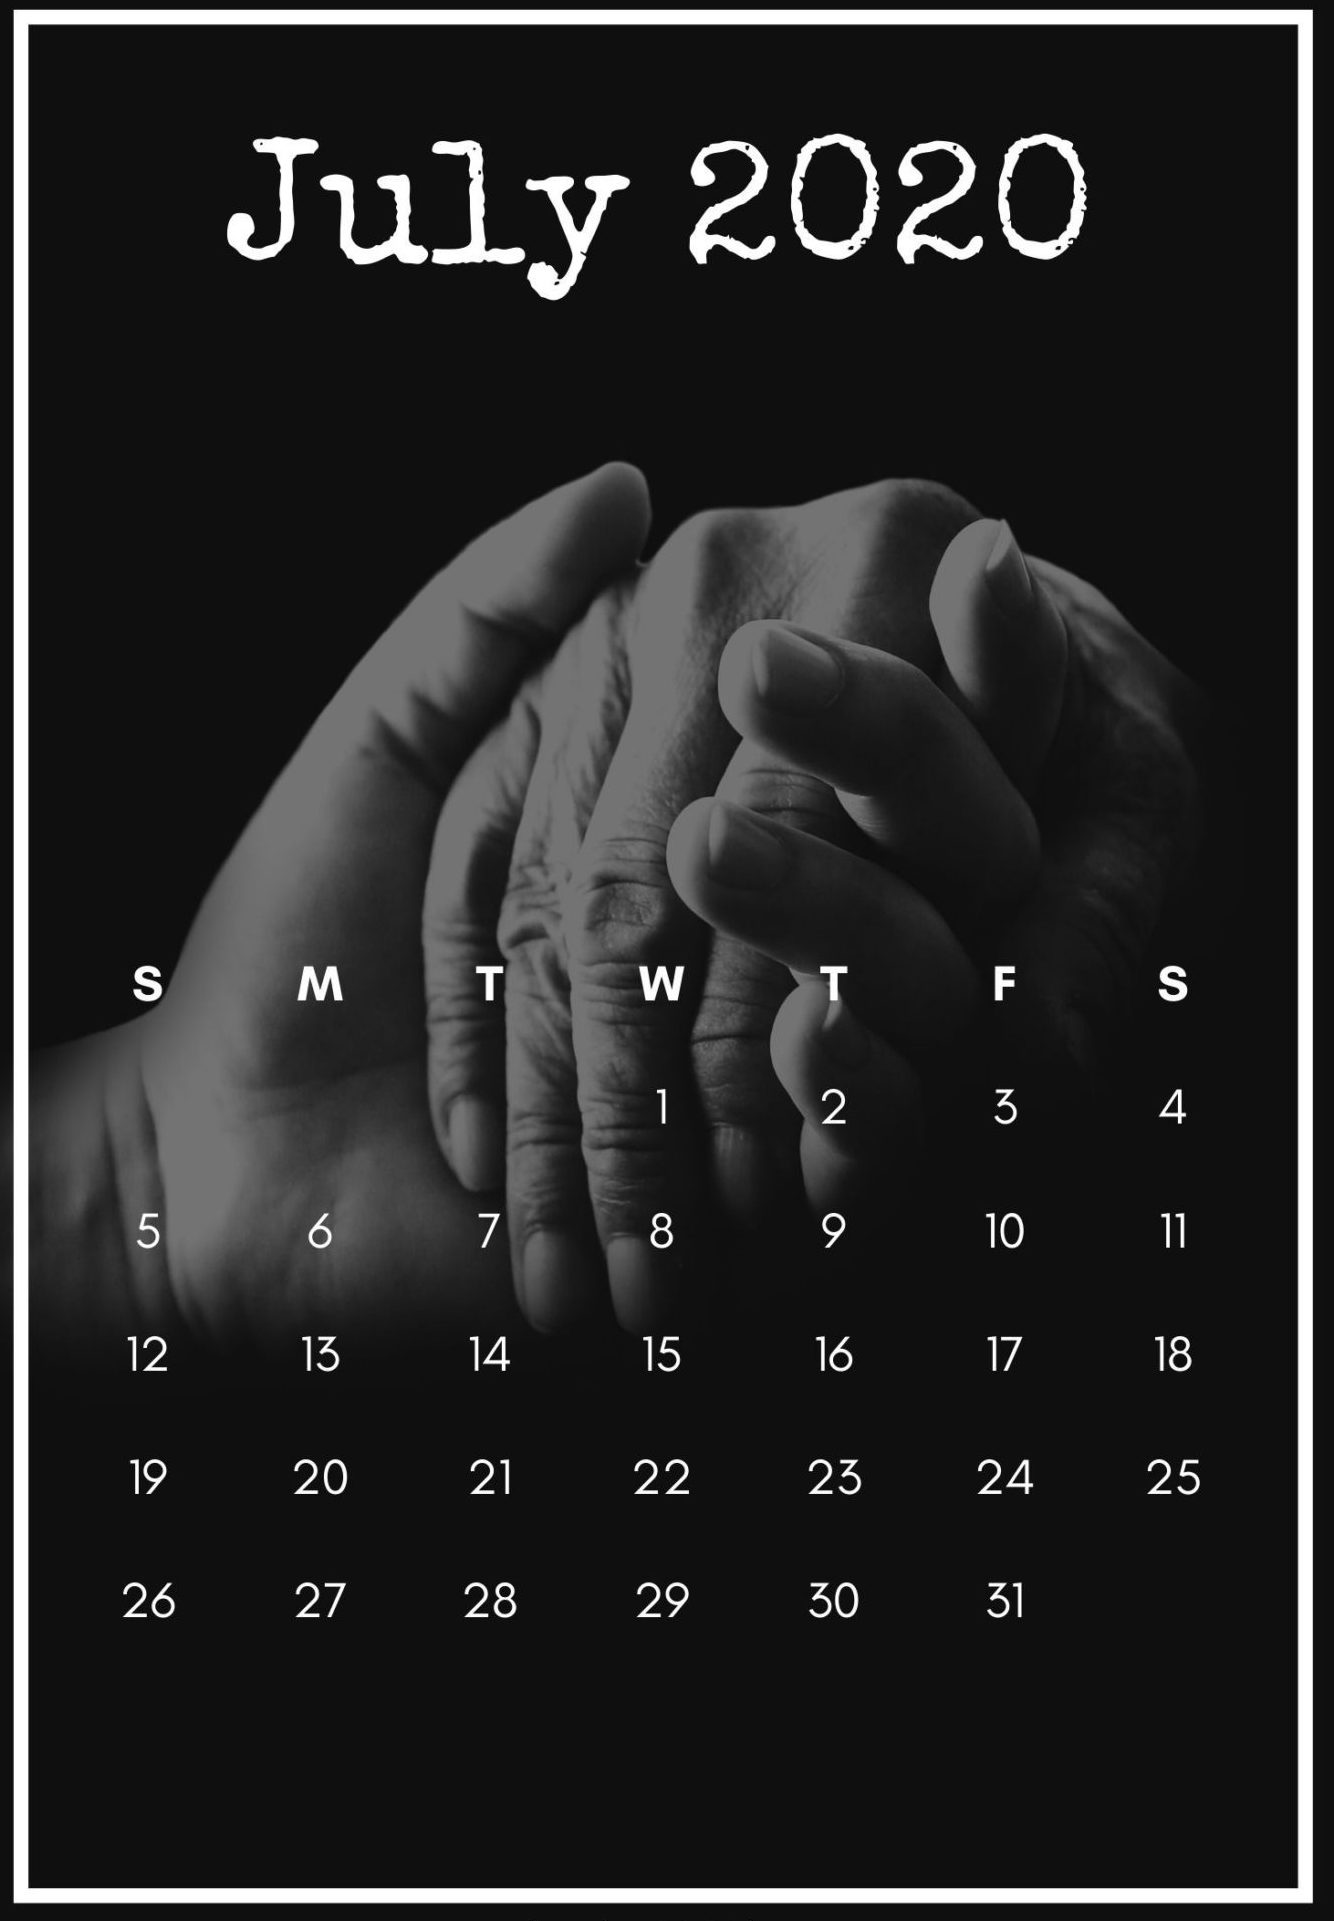 July 2020 Phone Calendar Wallpaper